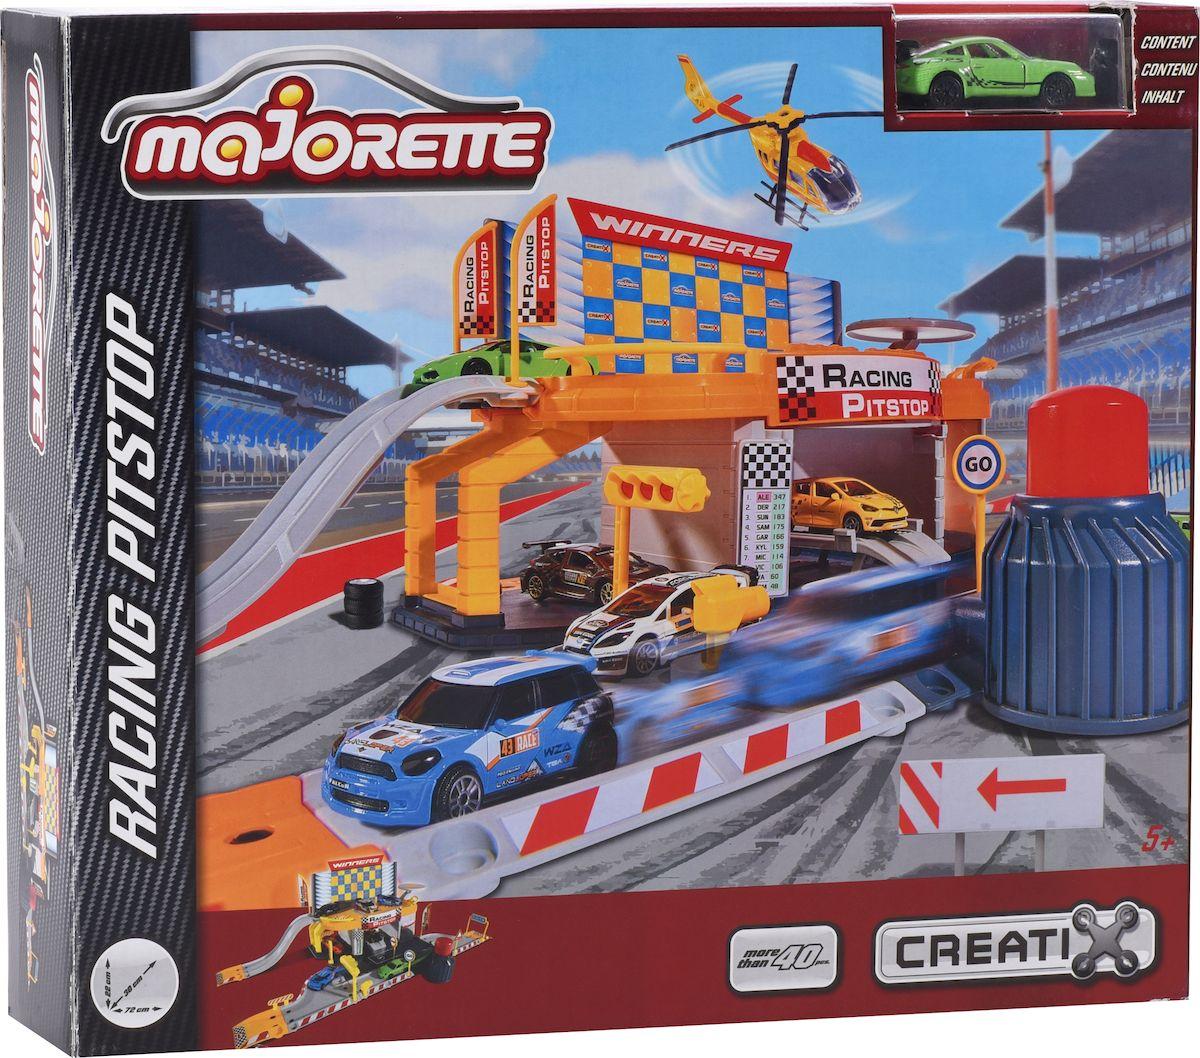 Majorette Игрушечный трек Пит-стоп с авто majorette creatix игрушечный трек starter pack